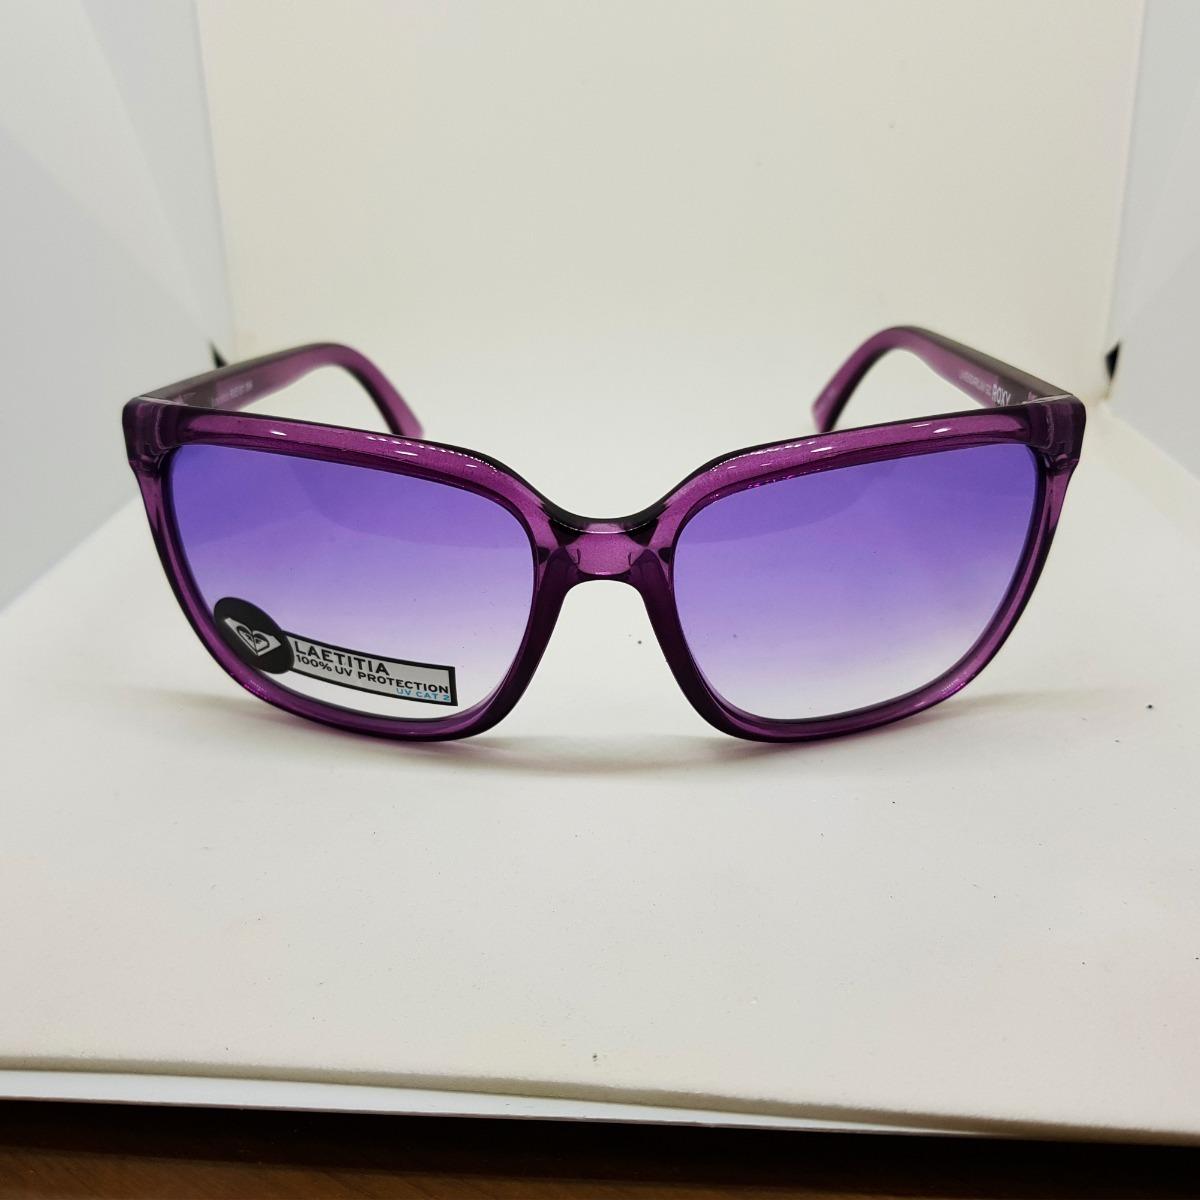 Óculos De Sol Roxy Laetitia 5181 896 - R  193,00 em Mercado Livre db339557e9